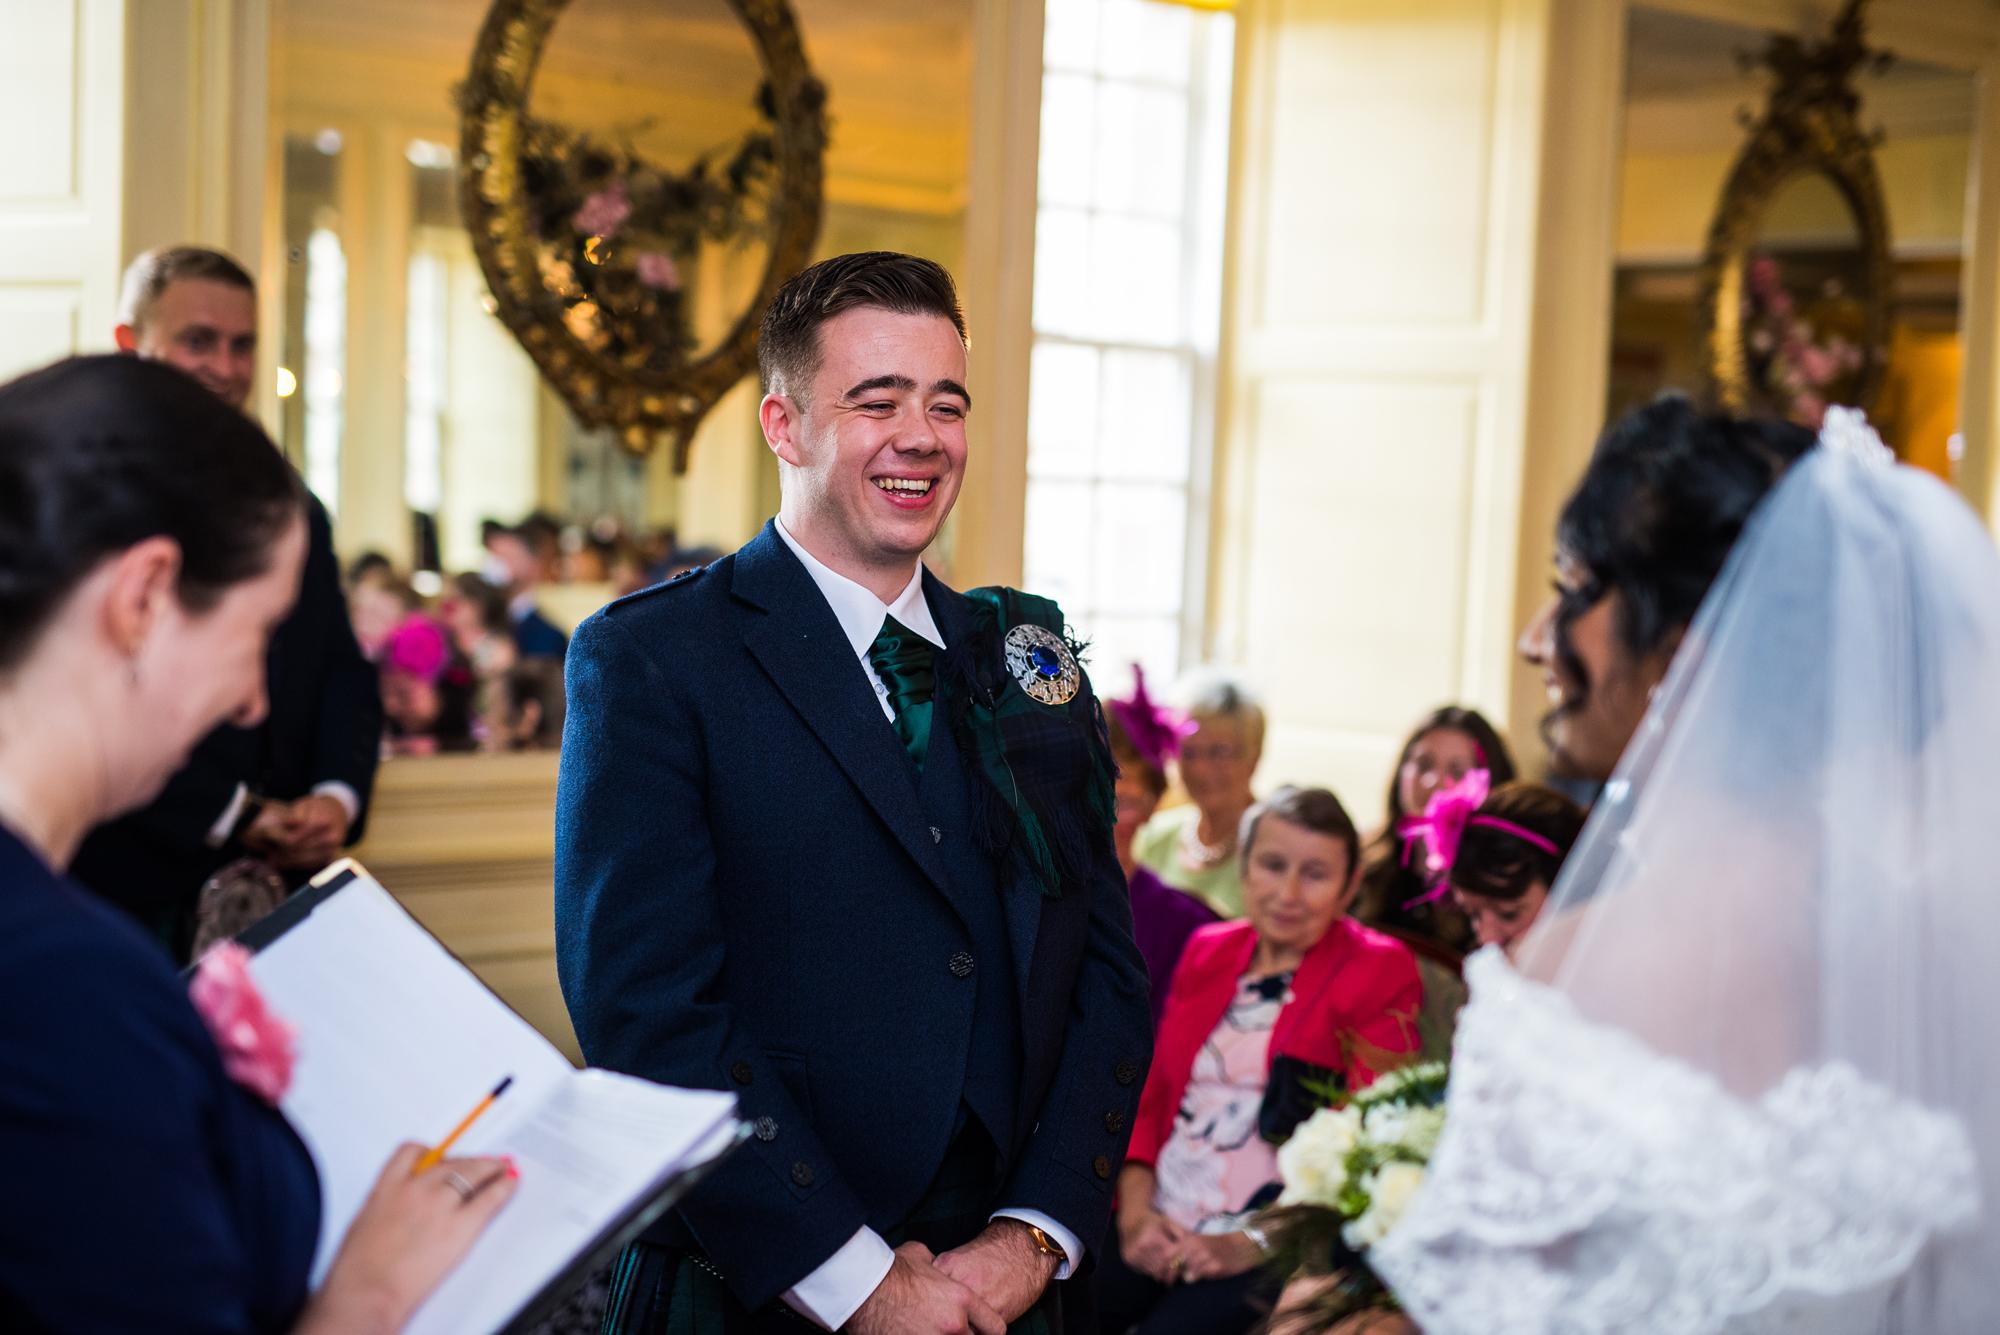 Kev and Shrabani wedding photos (128 of 350).jpg